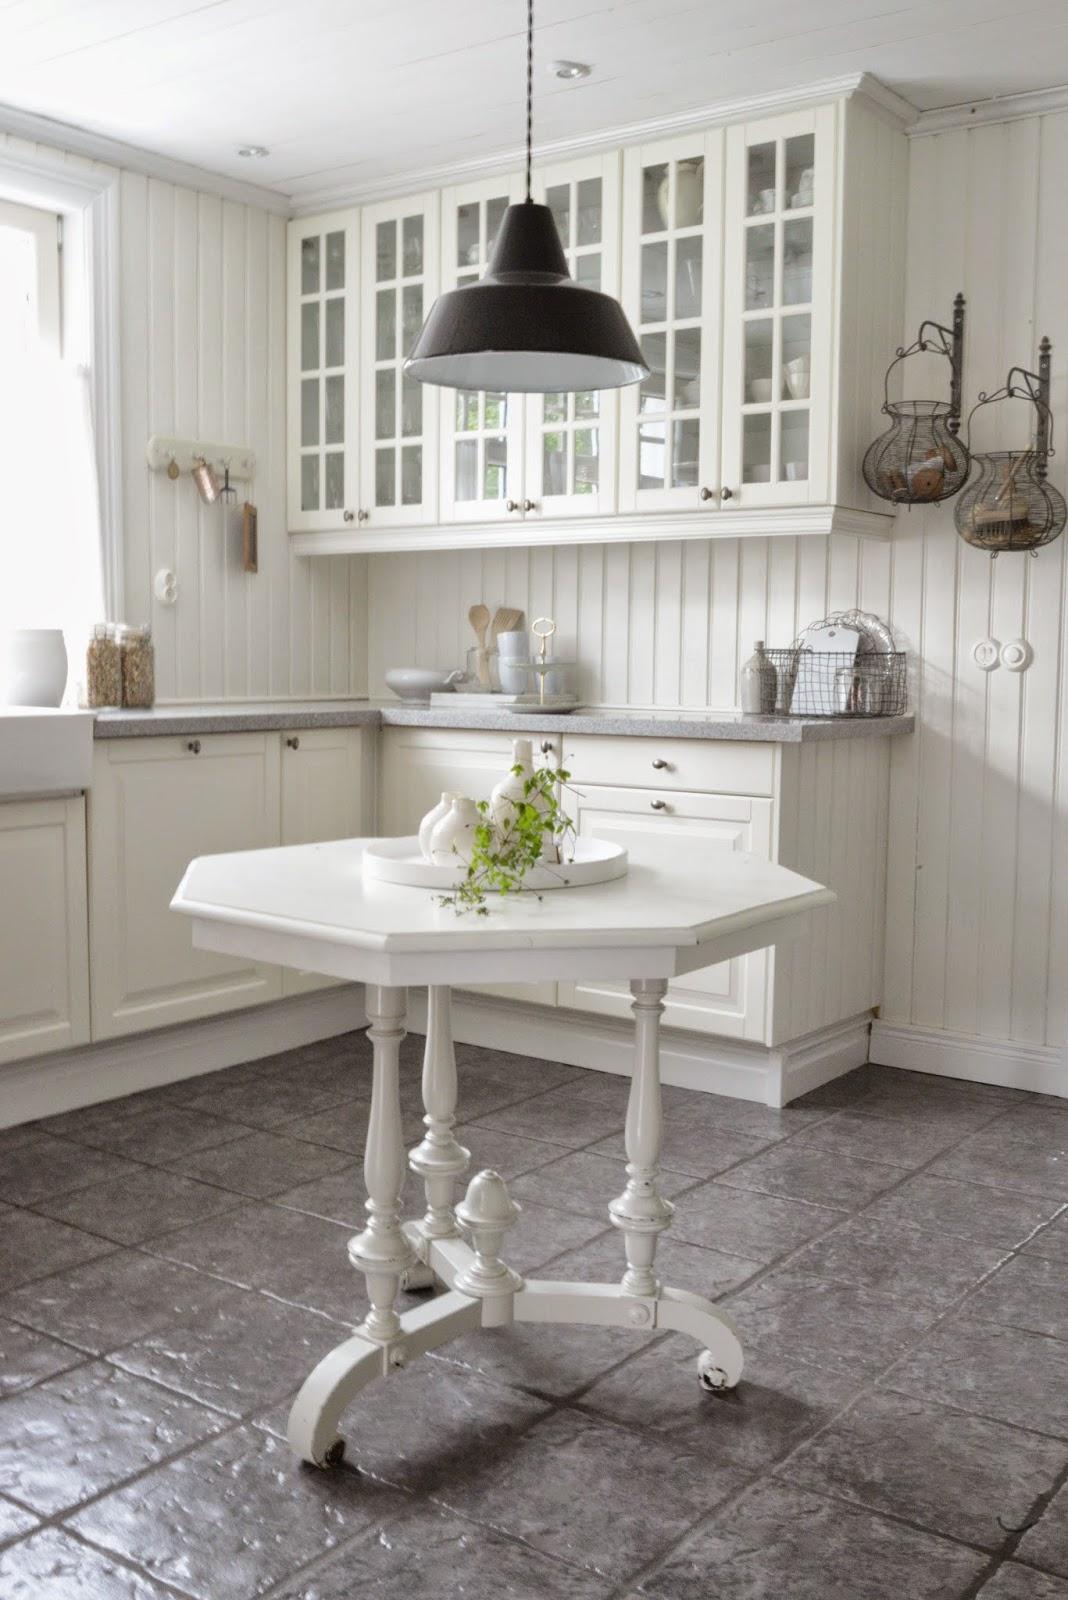 Kok Design Ikea : add design  anna stenberg  lantligt po svanongen Lantligt kok!